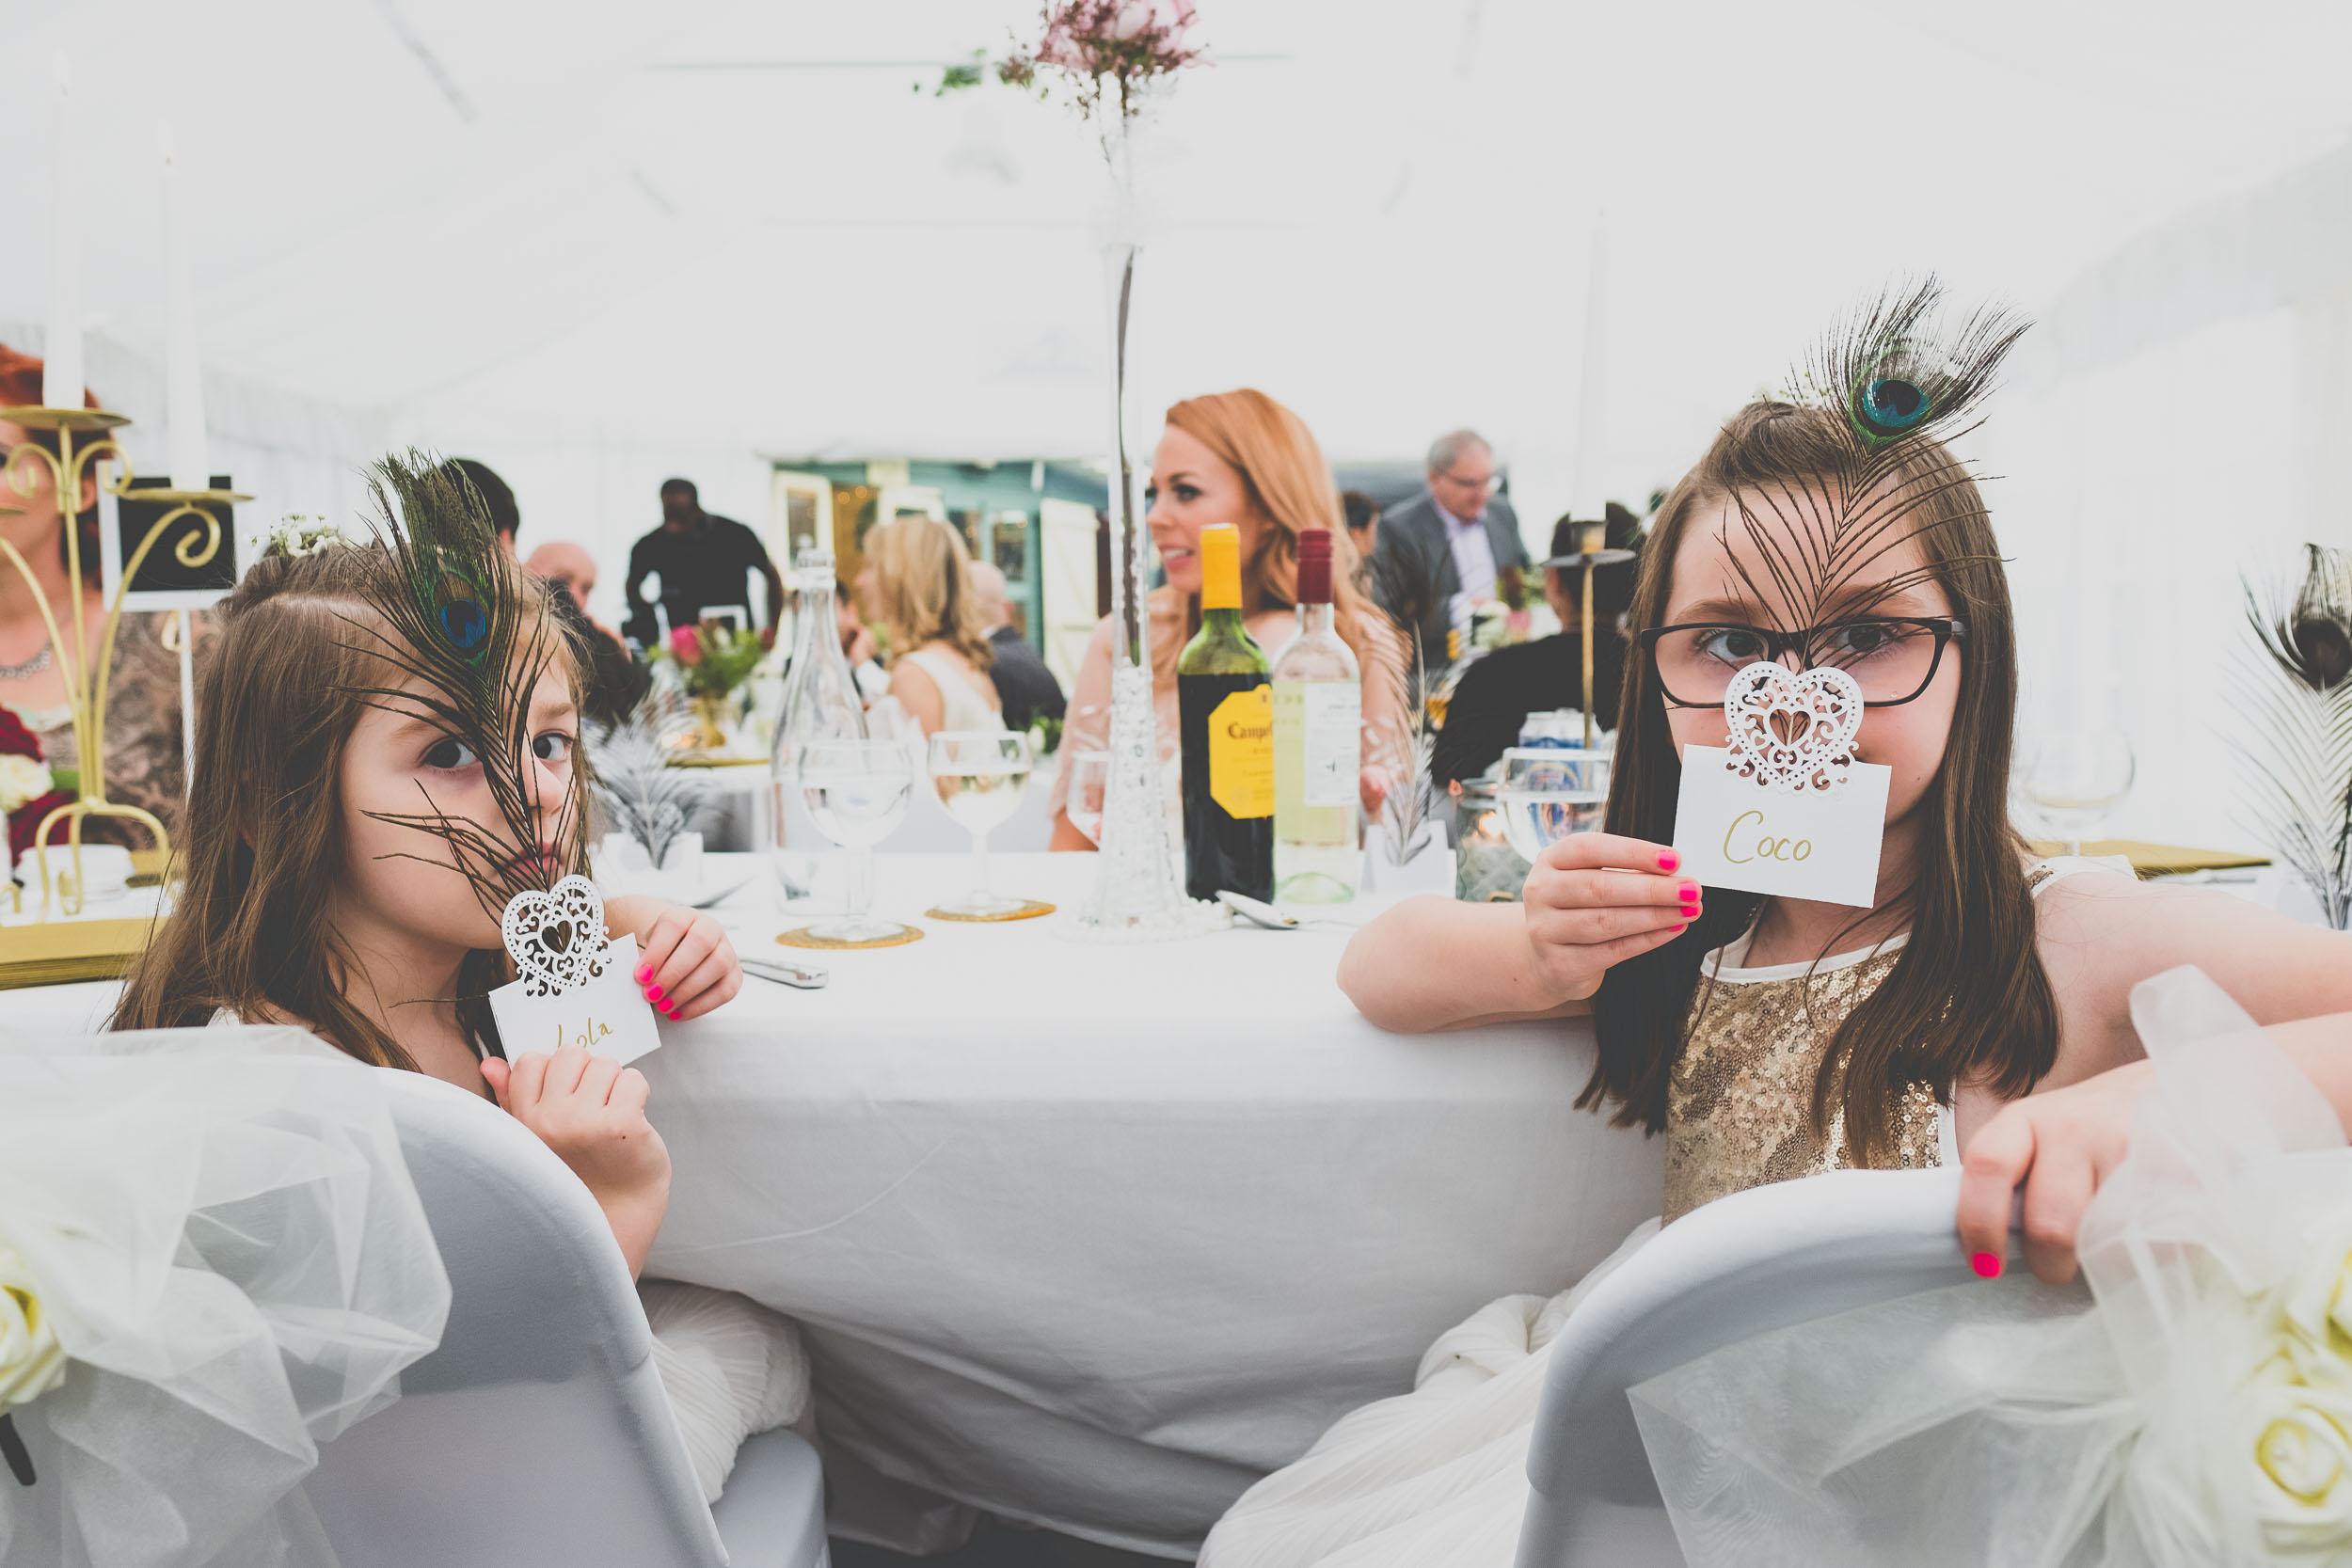 queen-elizabeths-hunting-lodge-epping-forest-wedding306.jpg